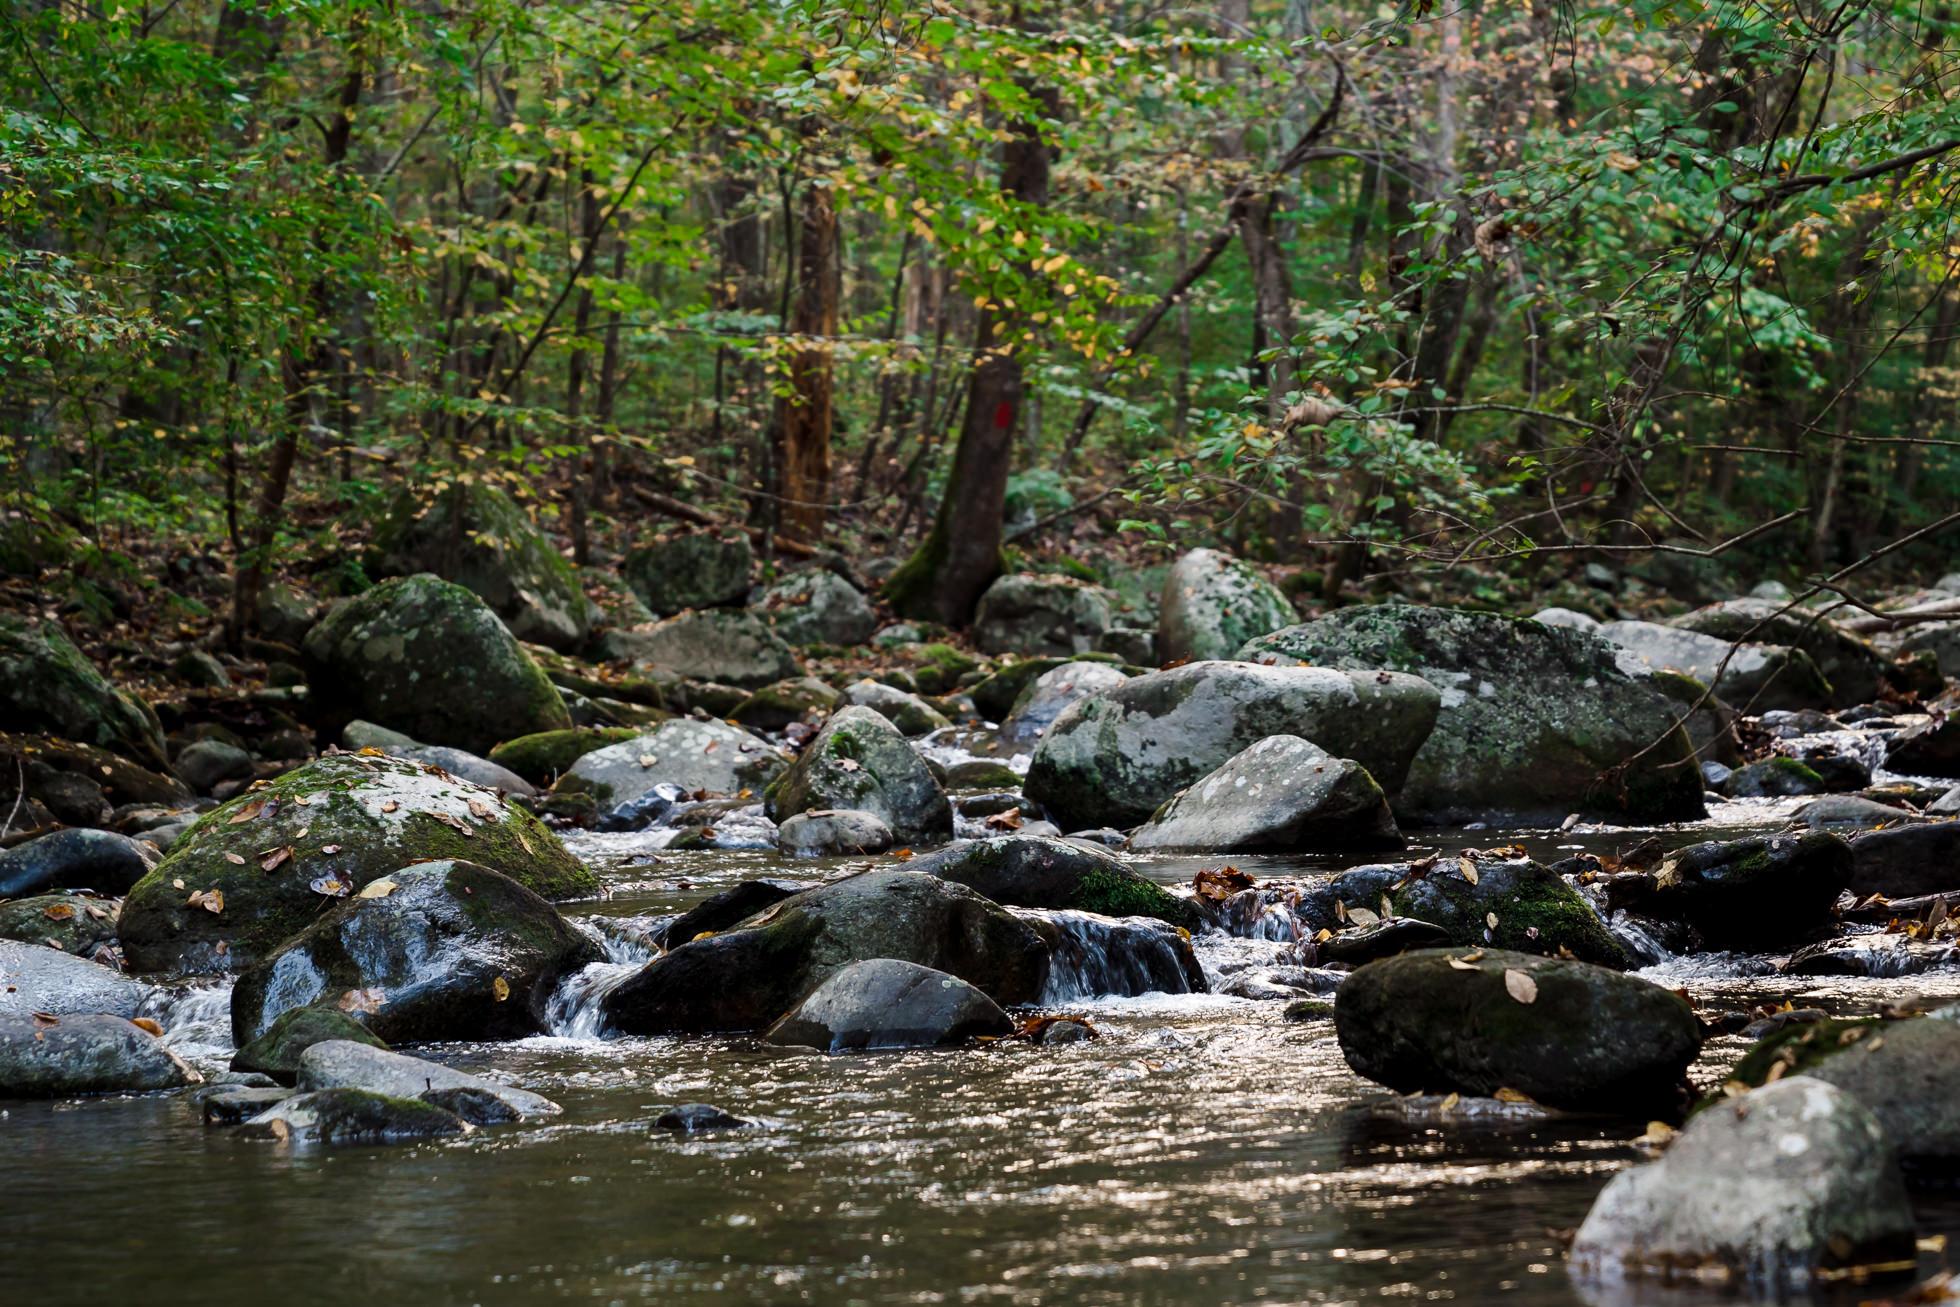 crabtree falls campground stream, tye rive